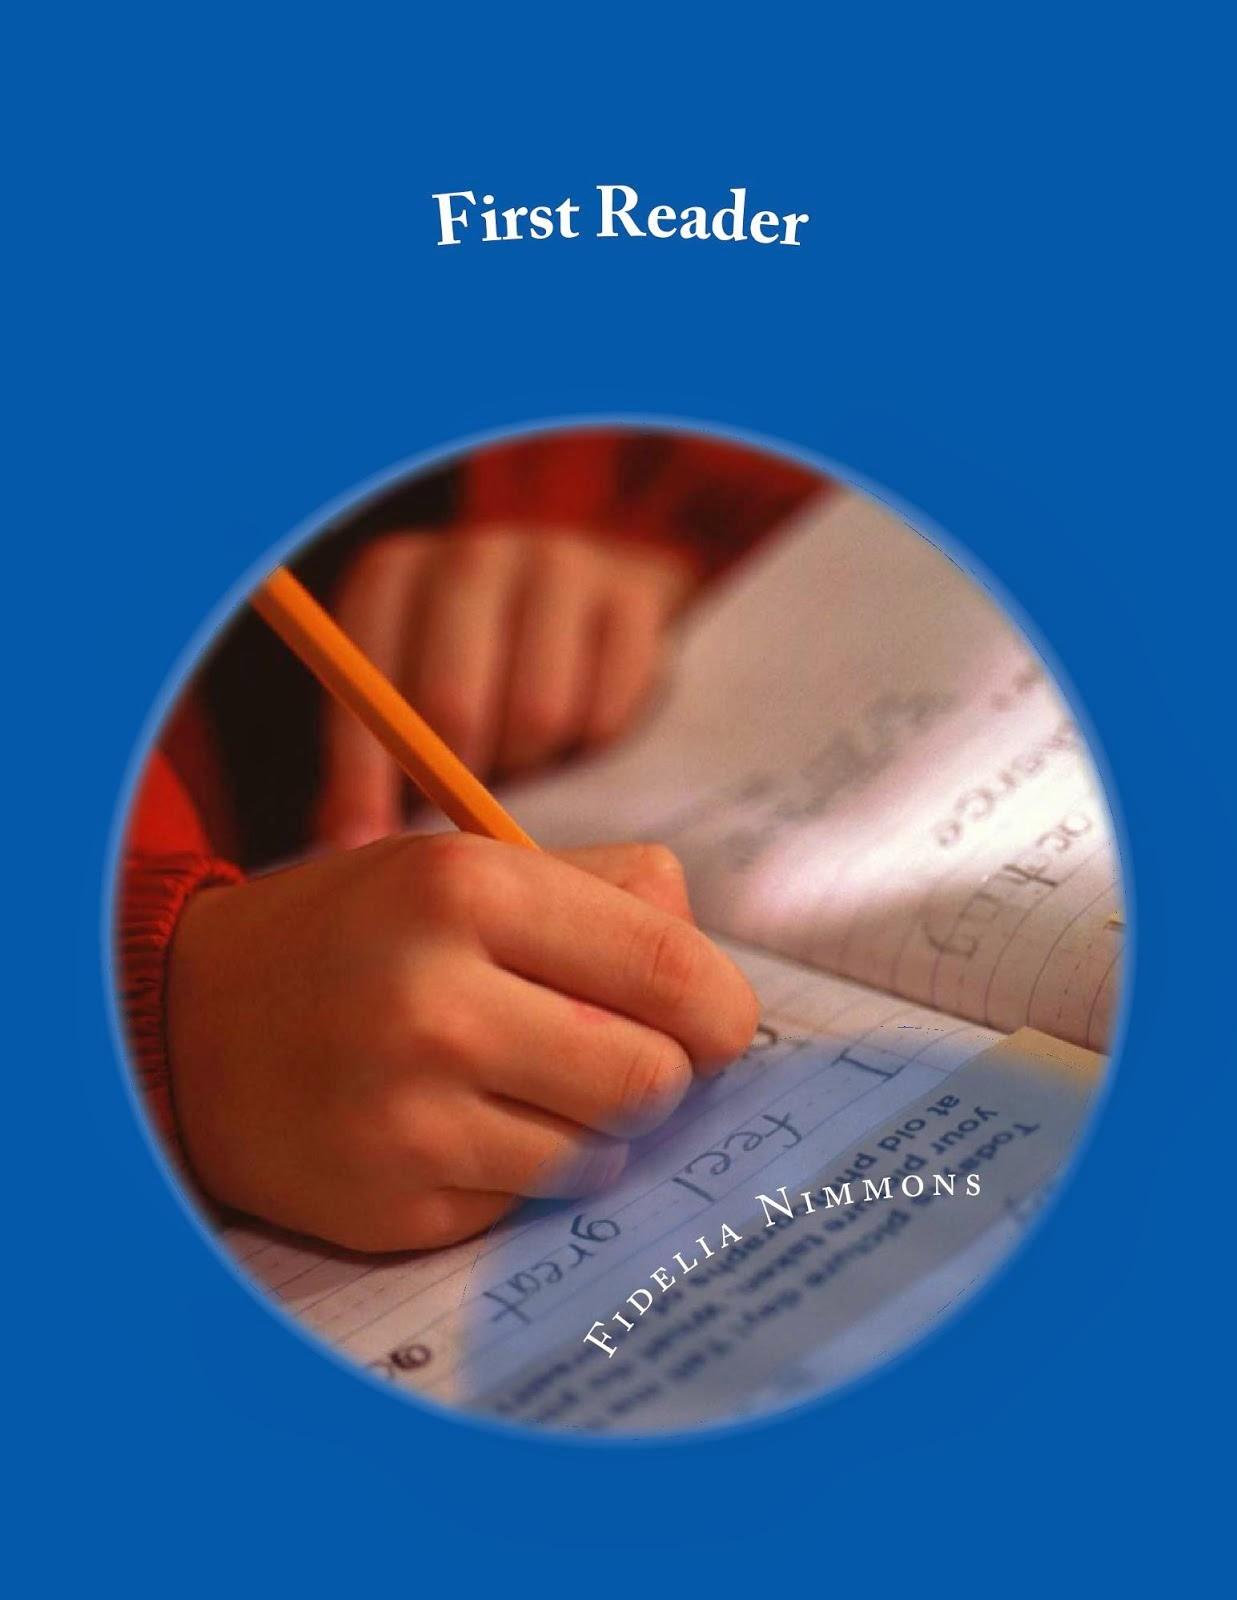 First Reader